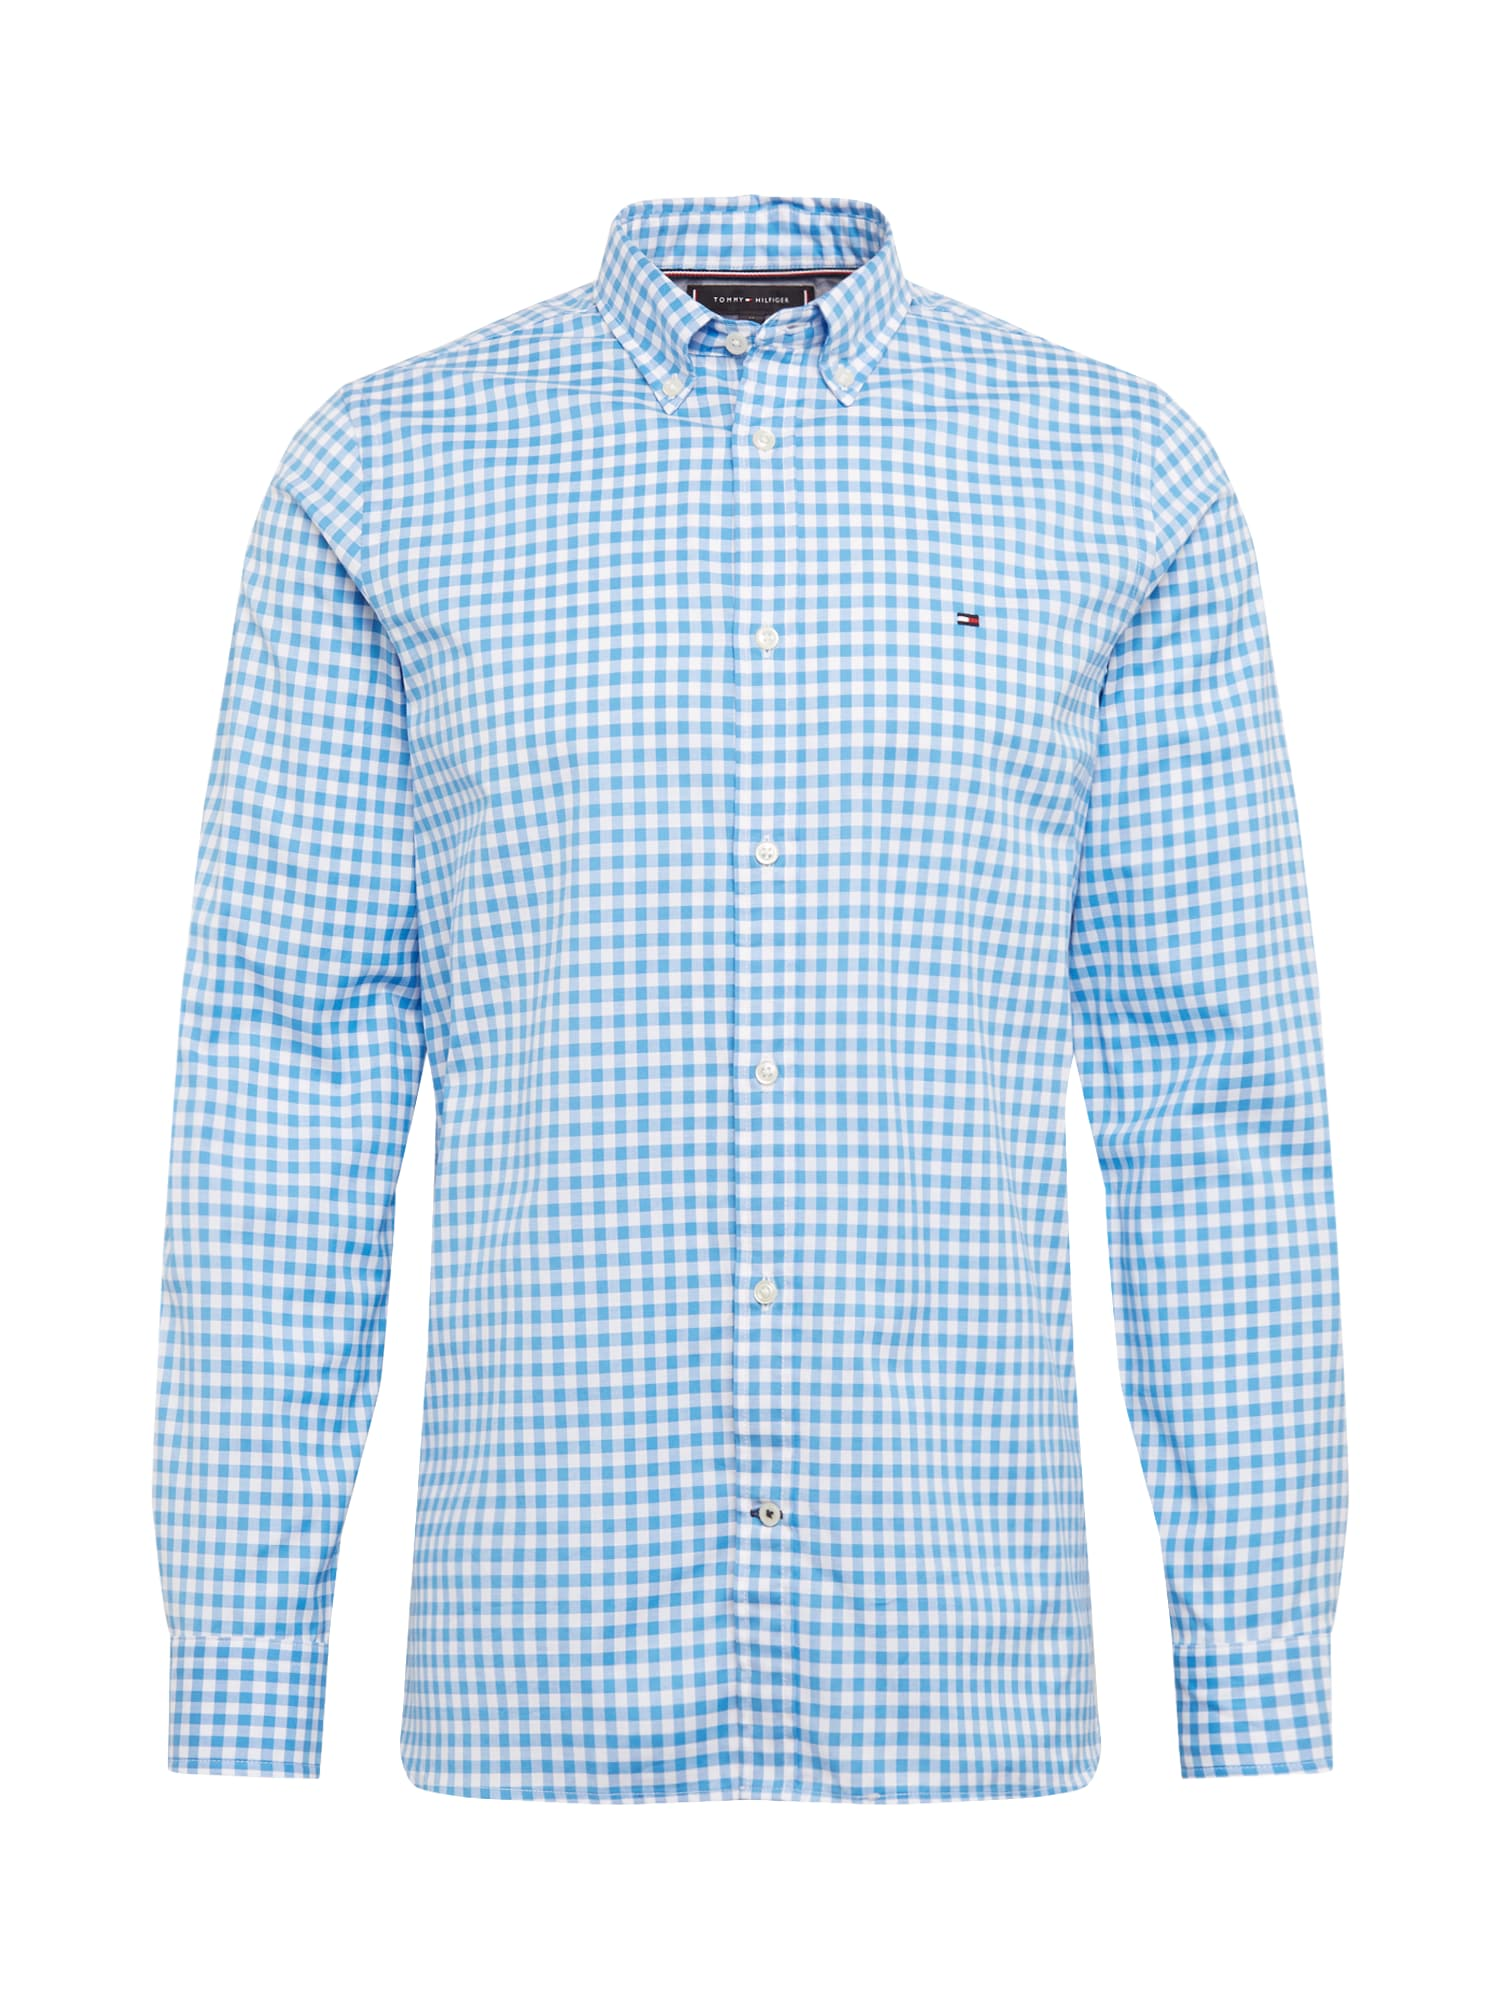 TOMMY HILFIGER Dalykiniai marškiniai 'GINGHAM' mėlyna / balta